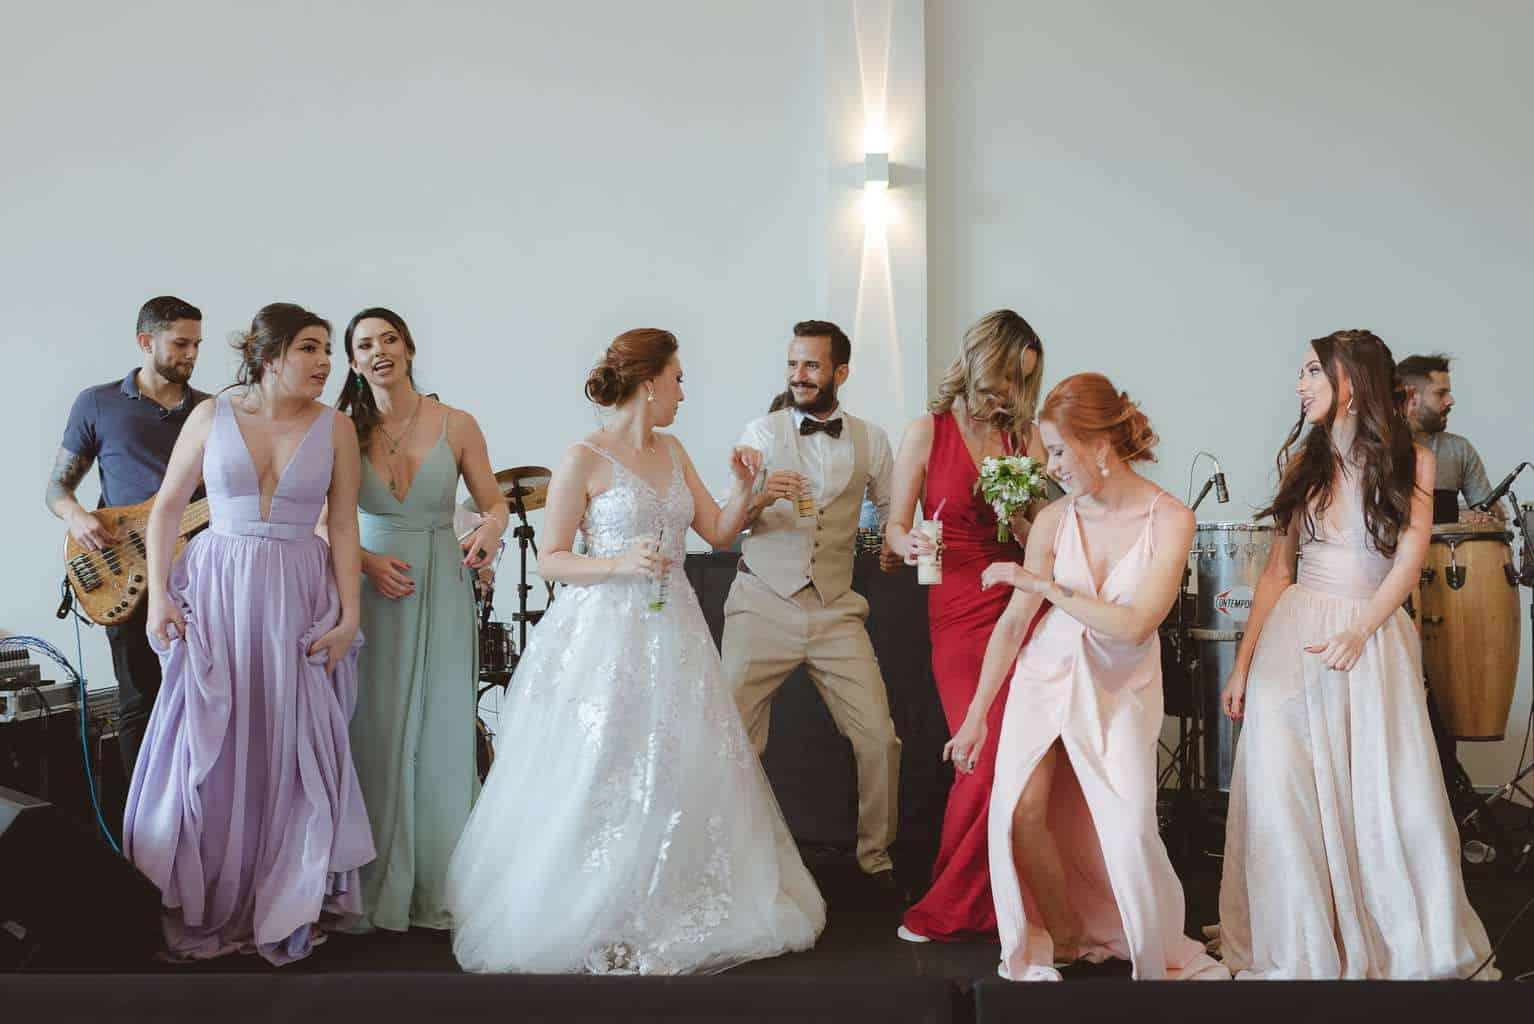 casamento-ao-ar-livre-casamento-boho-casamento-geek-casamento-rustico-casamento-Thais-e-Pedro-festa-Revoar-Fotografia-Villa-Borghese-Eventos-76